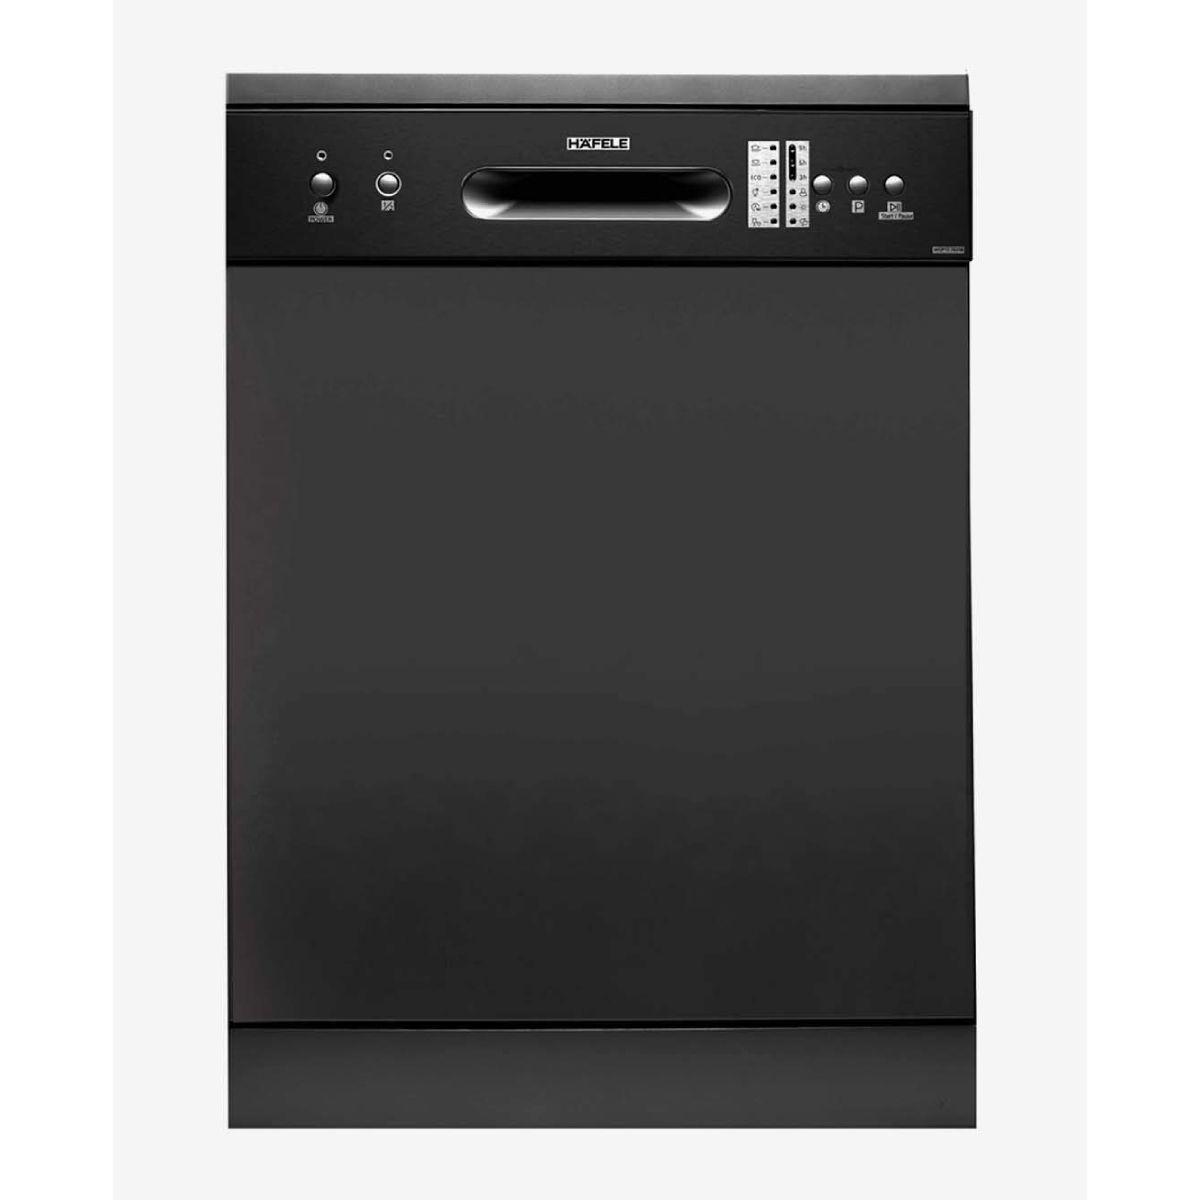 Hafele Aqua 14XL Dishwasher